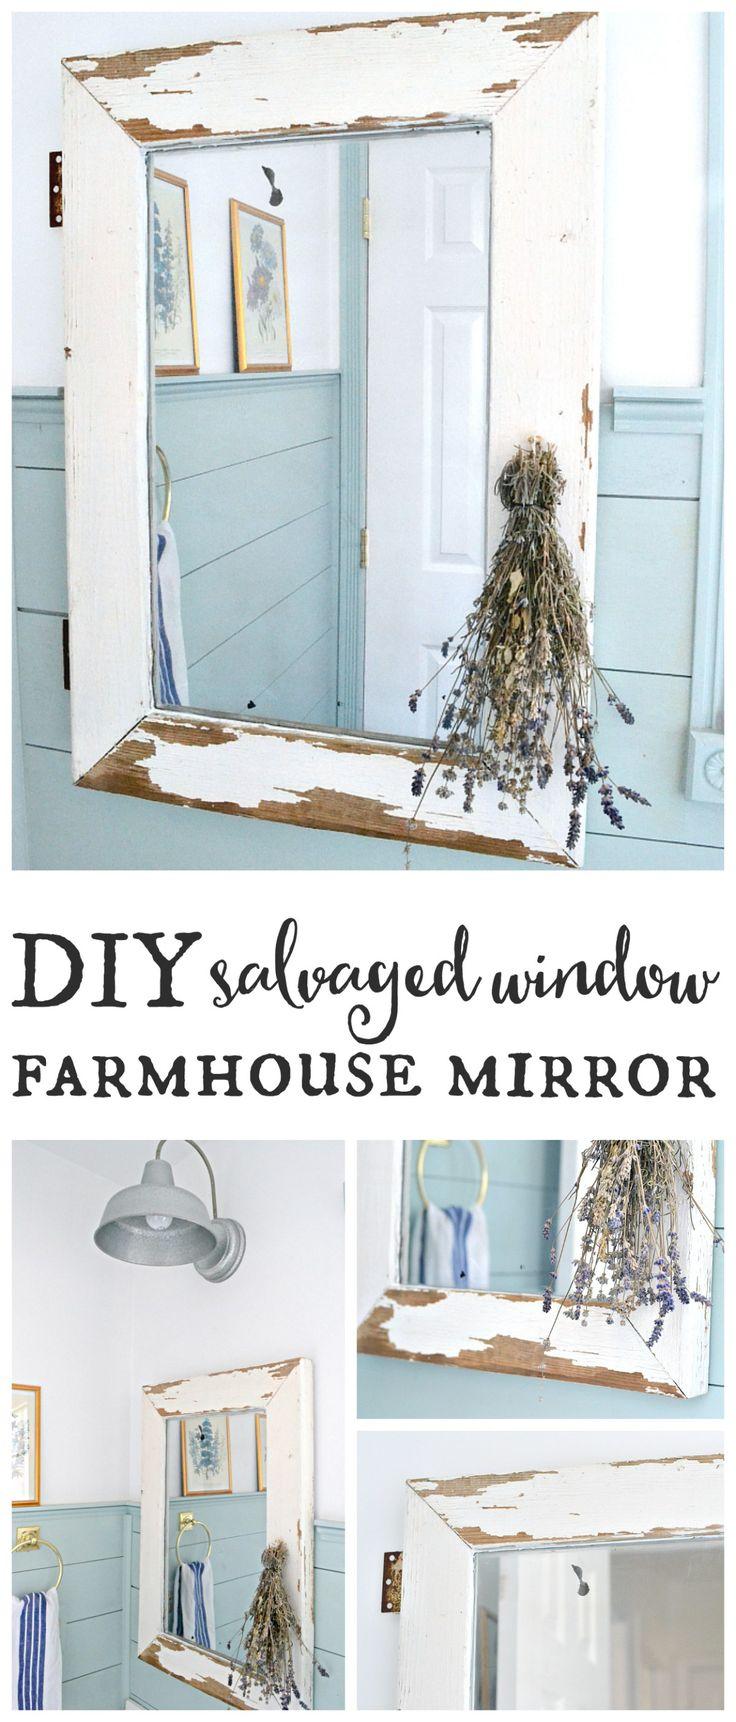 Salvaged window farmhouse mirror. Turn a salvaged window into a farmhouse mirror in just a few easy steps! Find it on theweatheredfox.com